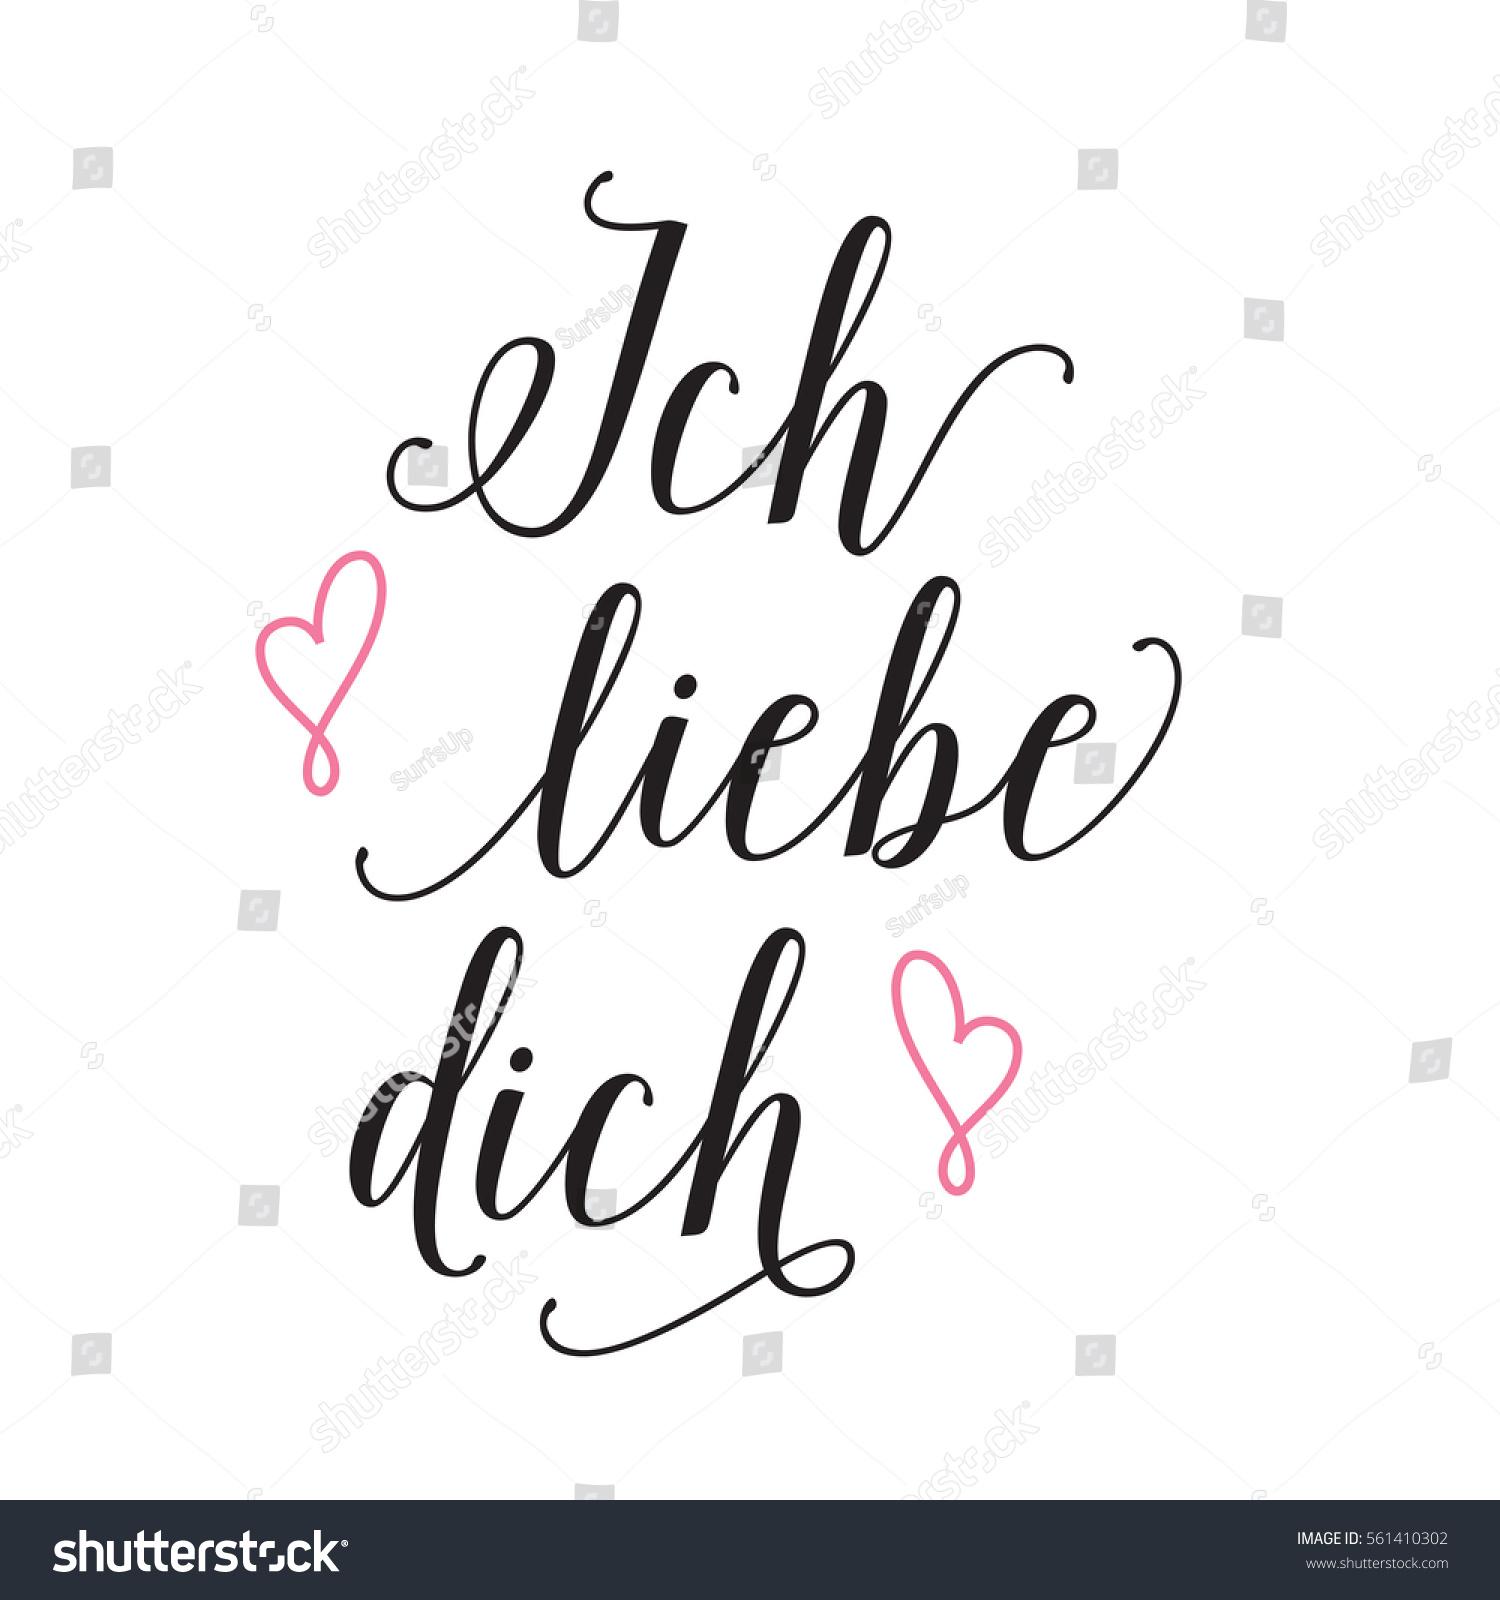 Ich Liebe Dich Lettering Confession Stock-Vektorgrafik (Lizenzfrei ...